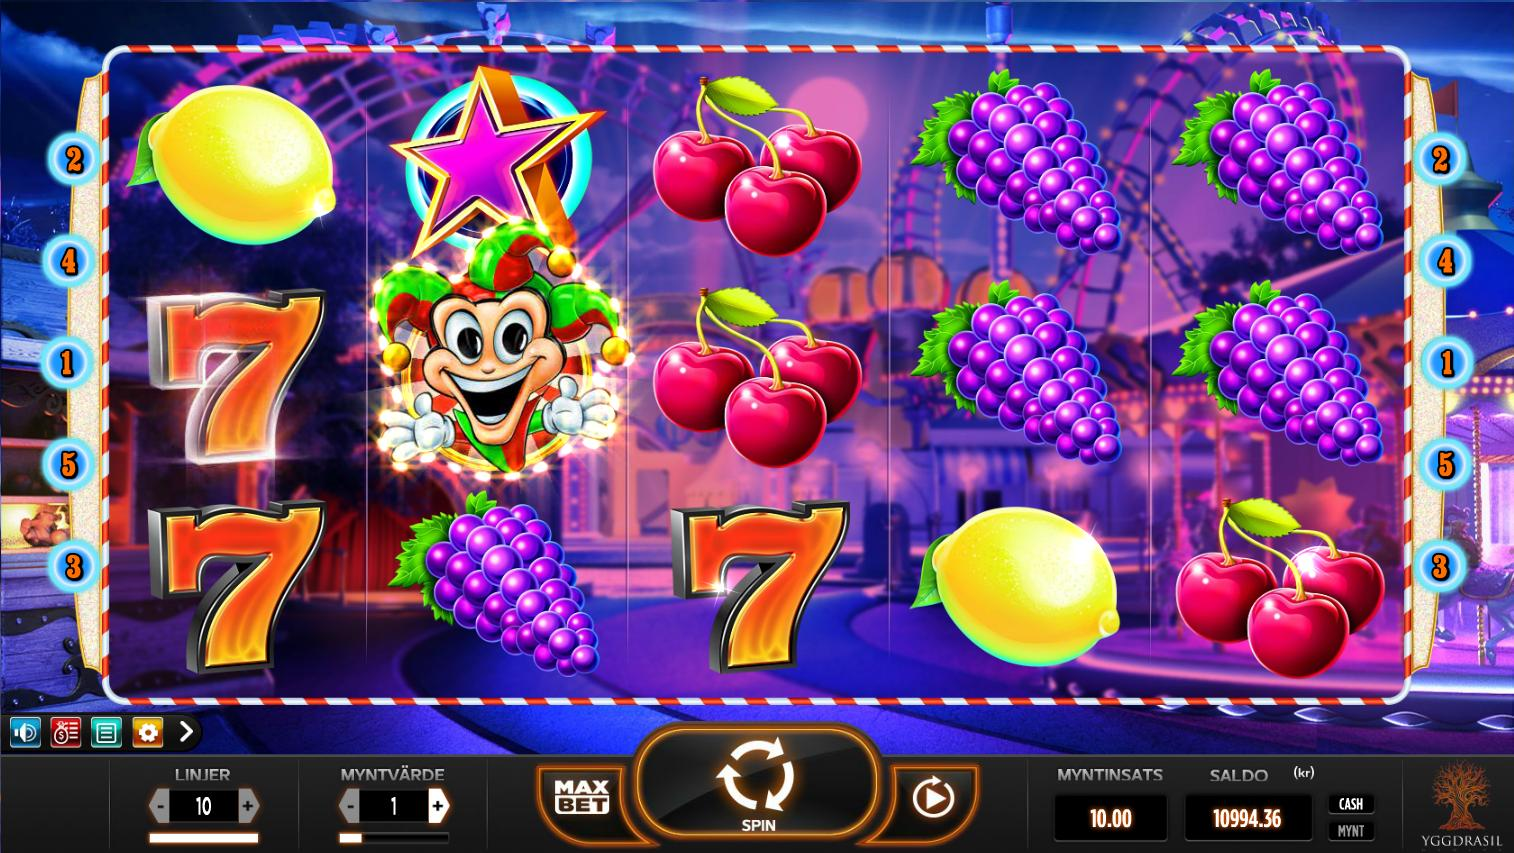 Casino spel gratis - 25091